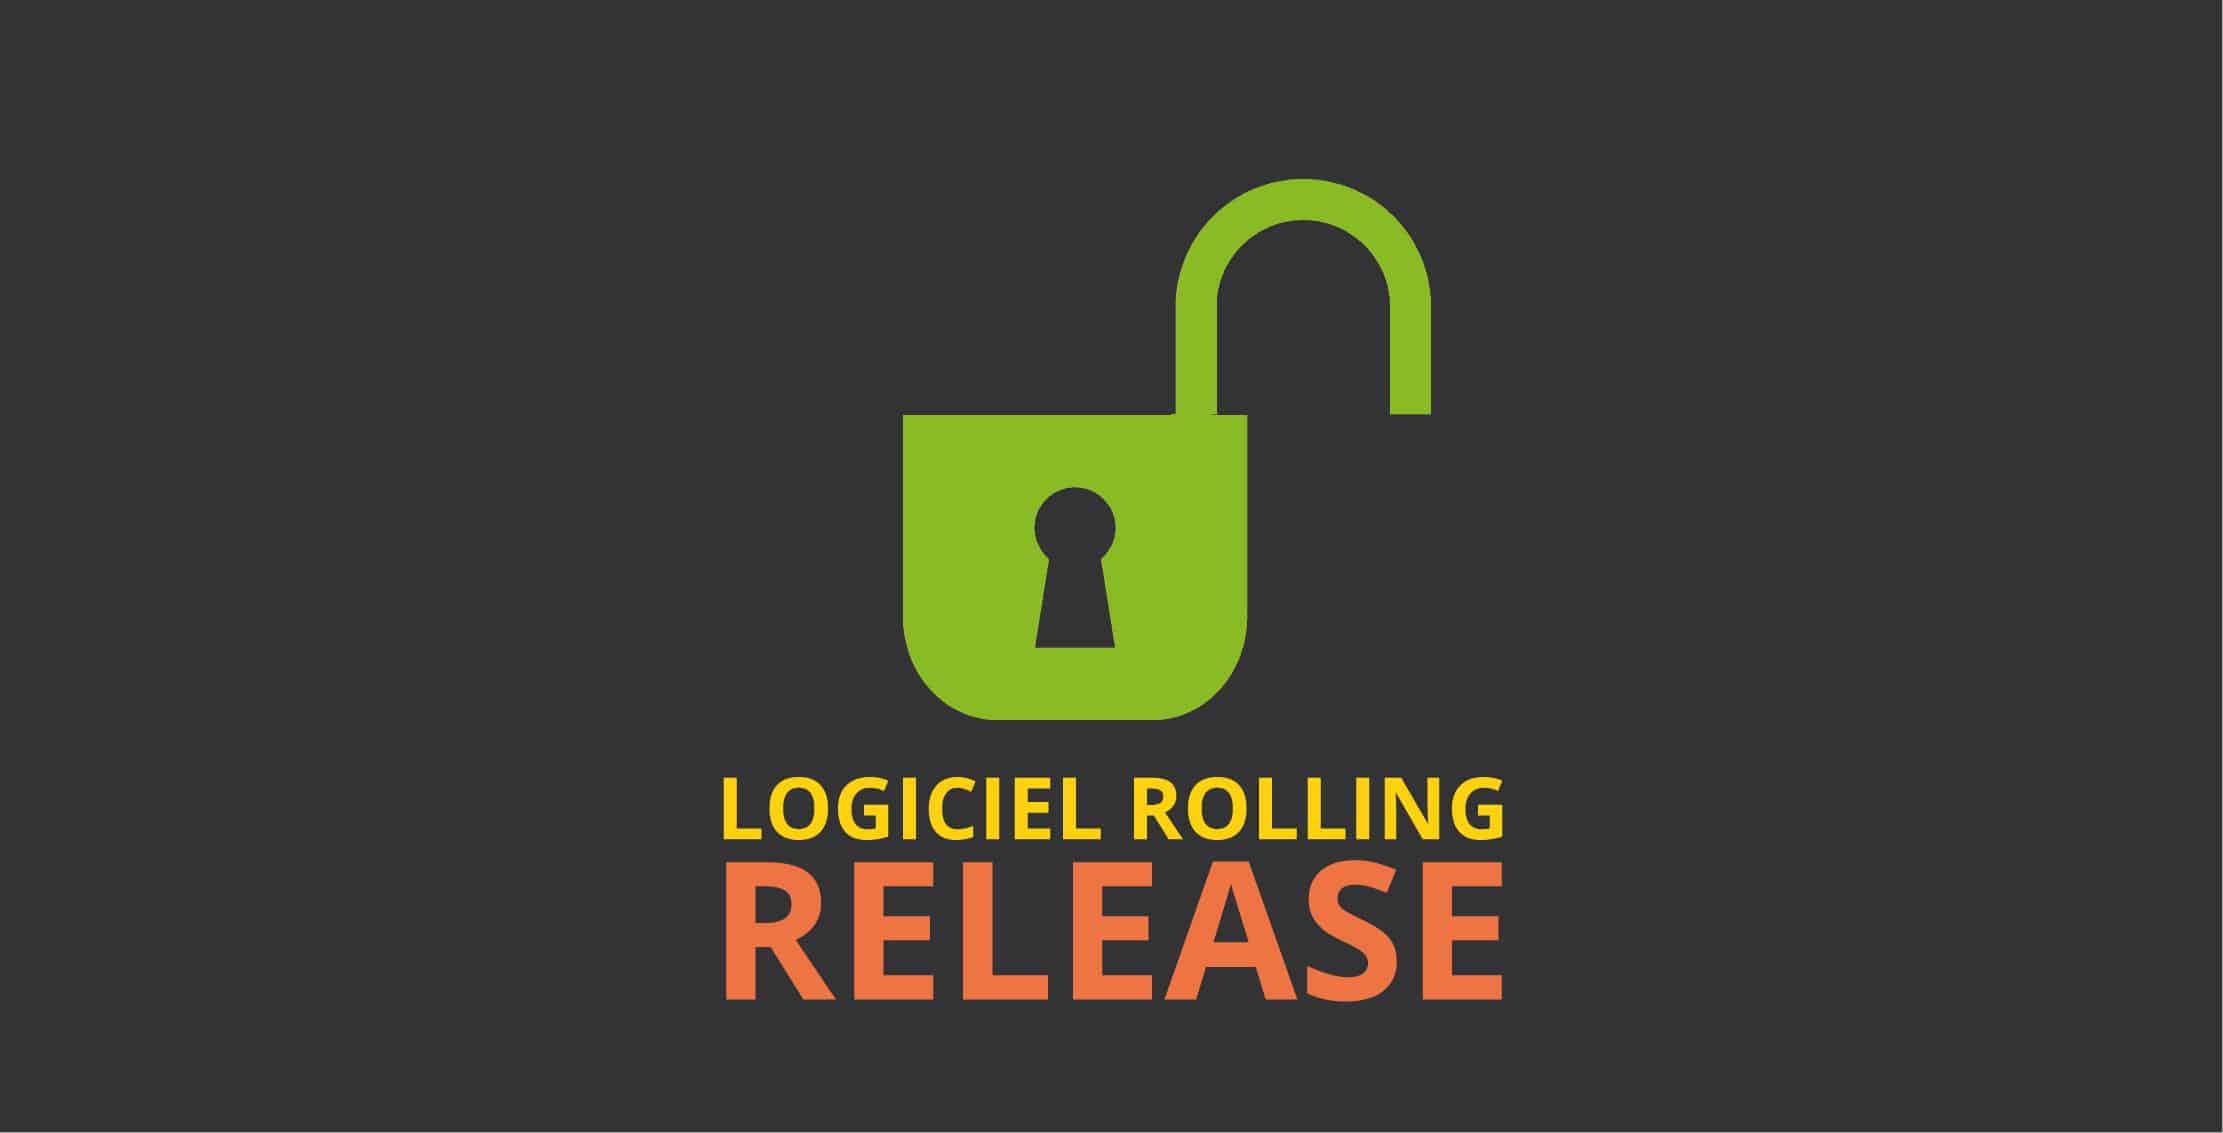 logiciel rolling release